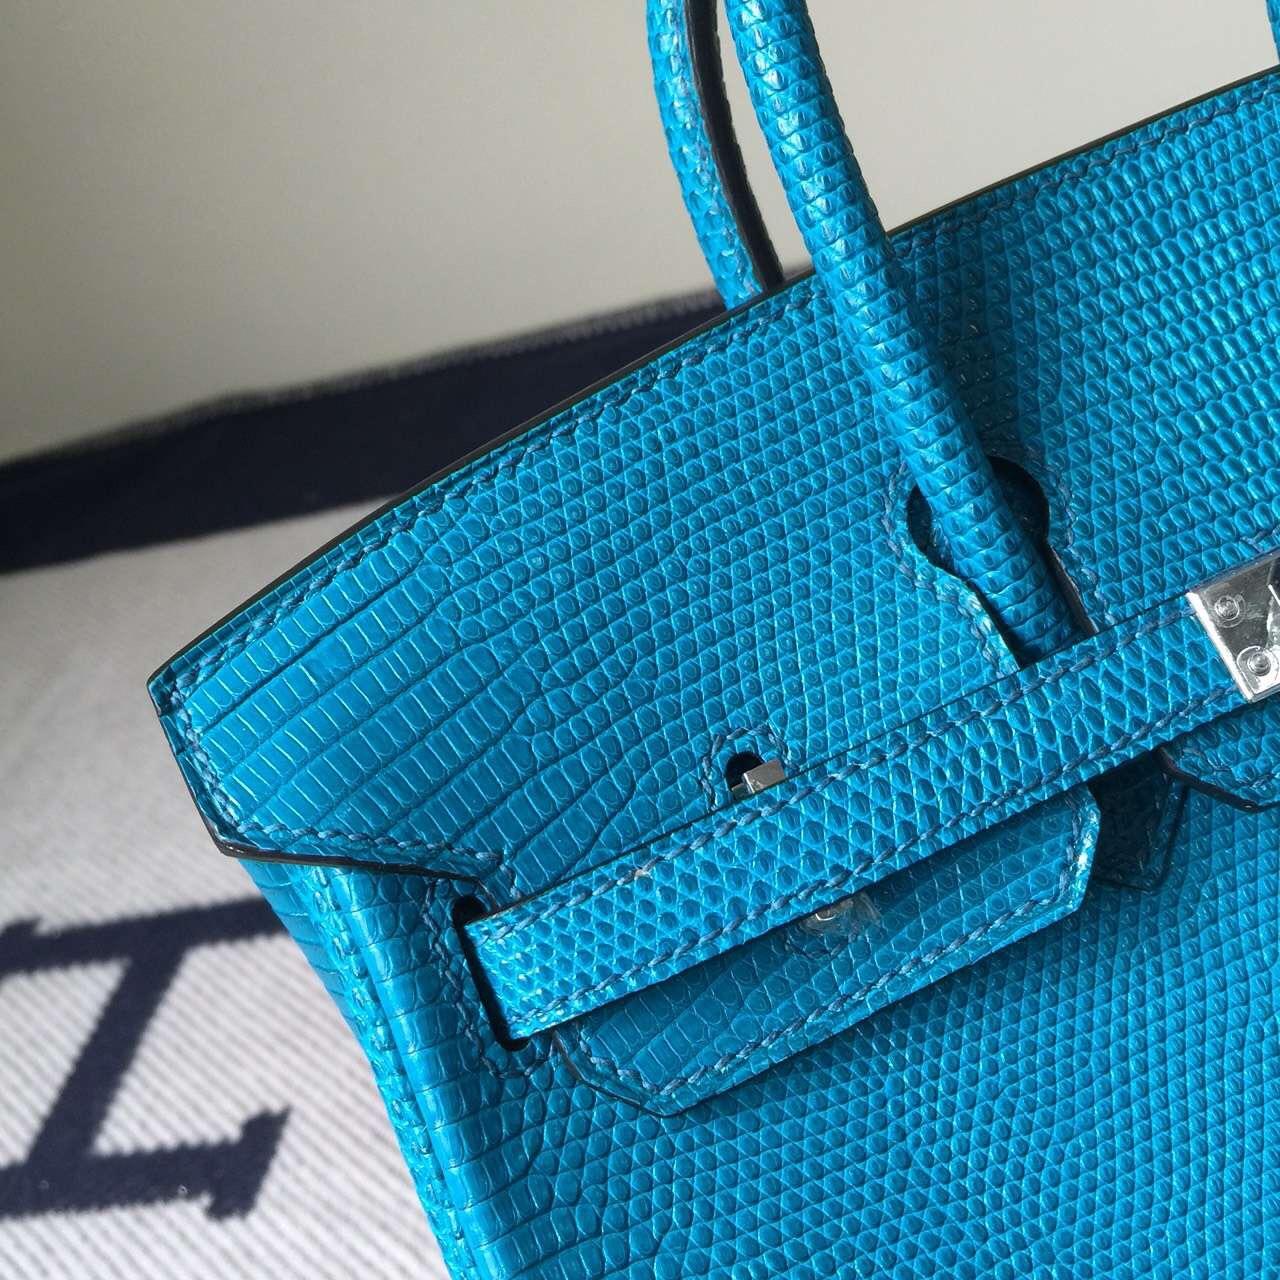 Sale Hermes 7W Blue Izmir Lizard Skin Leather Birkin Bag 25cm